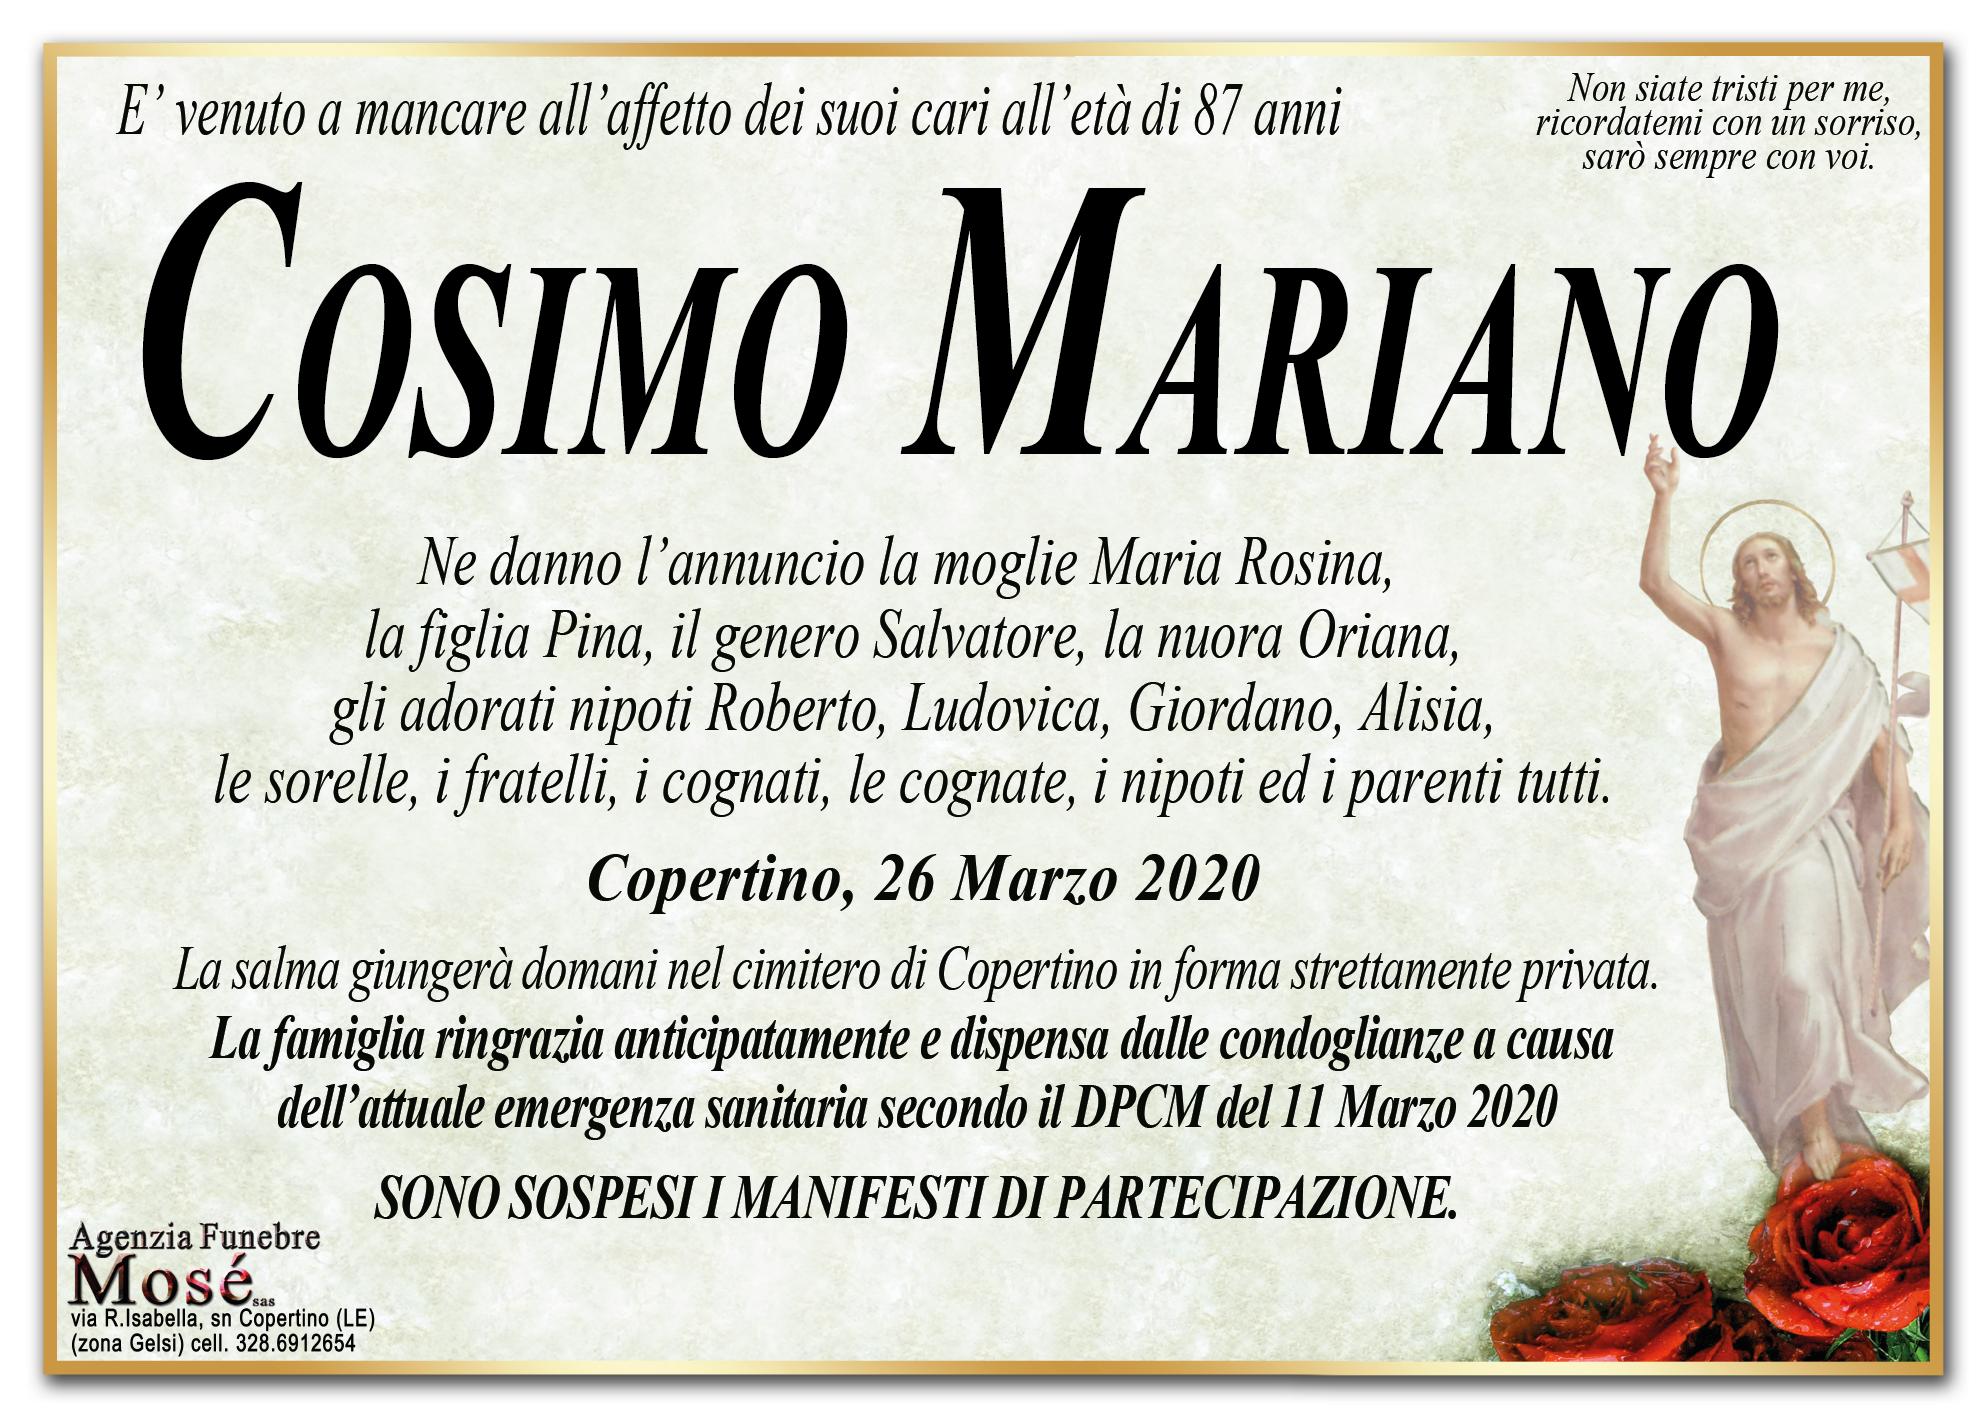 Cosimo Mariano